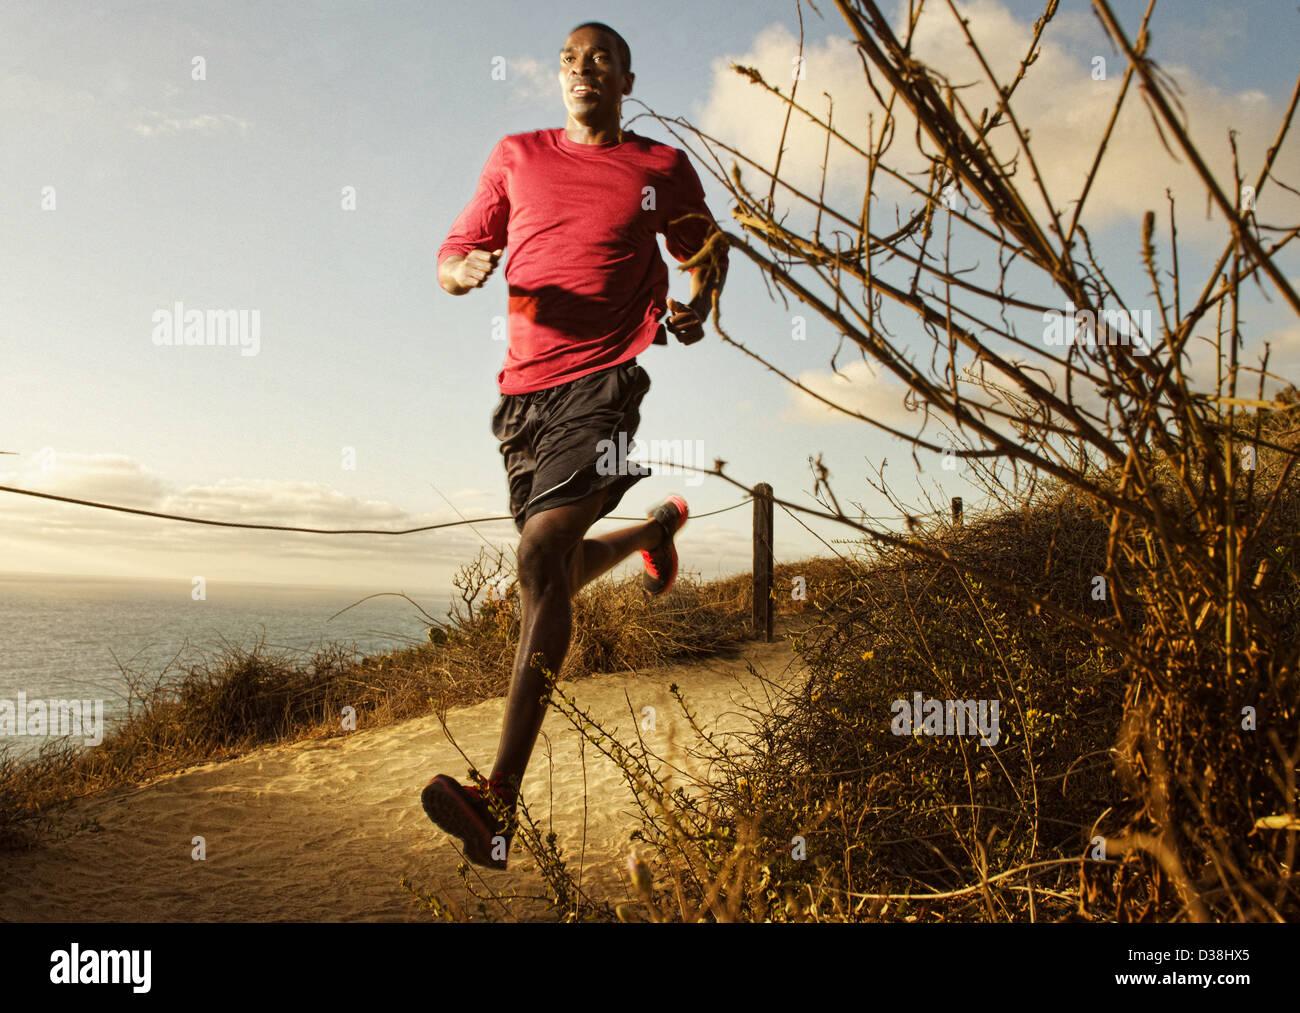 Man running on dirt path Photo Stock